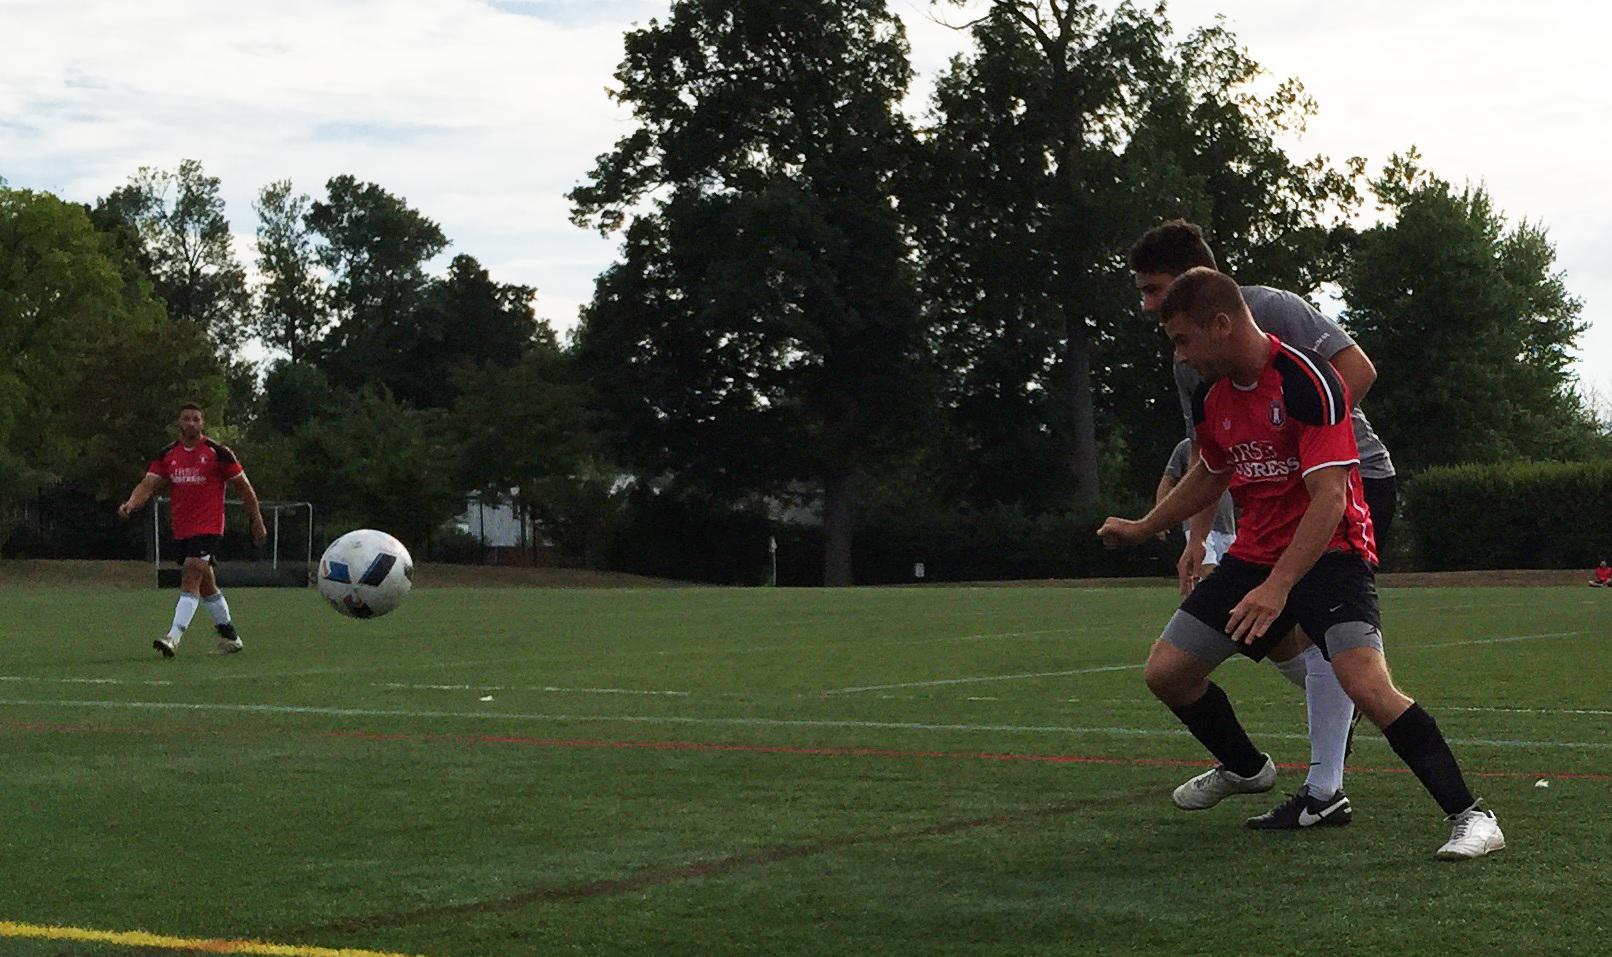 Justin Hofschneider, in red, races after a loose ball in the BDSL premier final. (Ben Tsujimoto/Buffalo News)